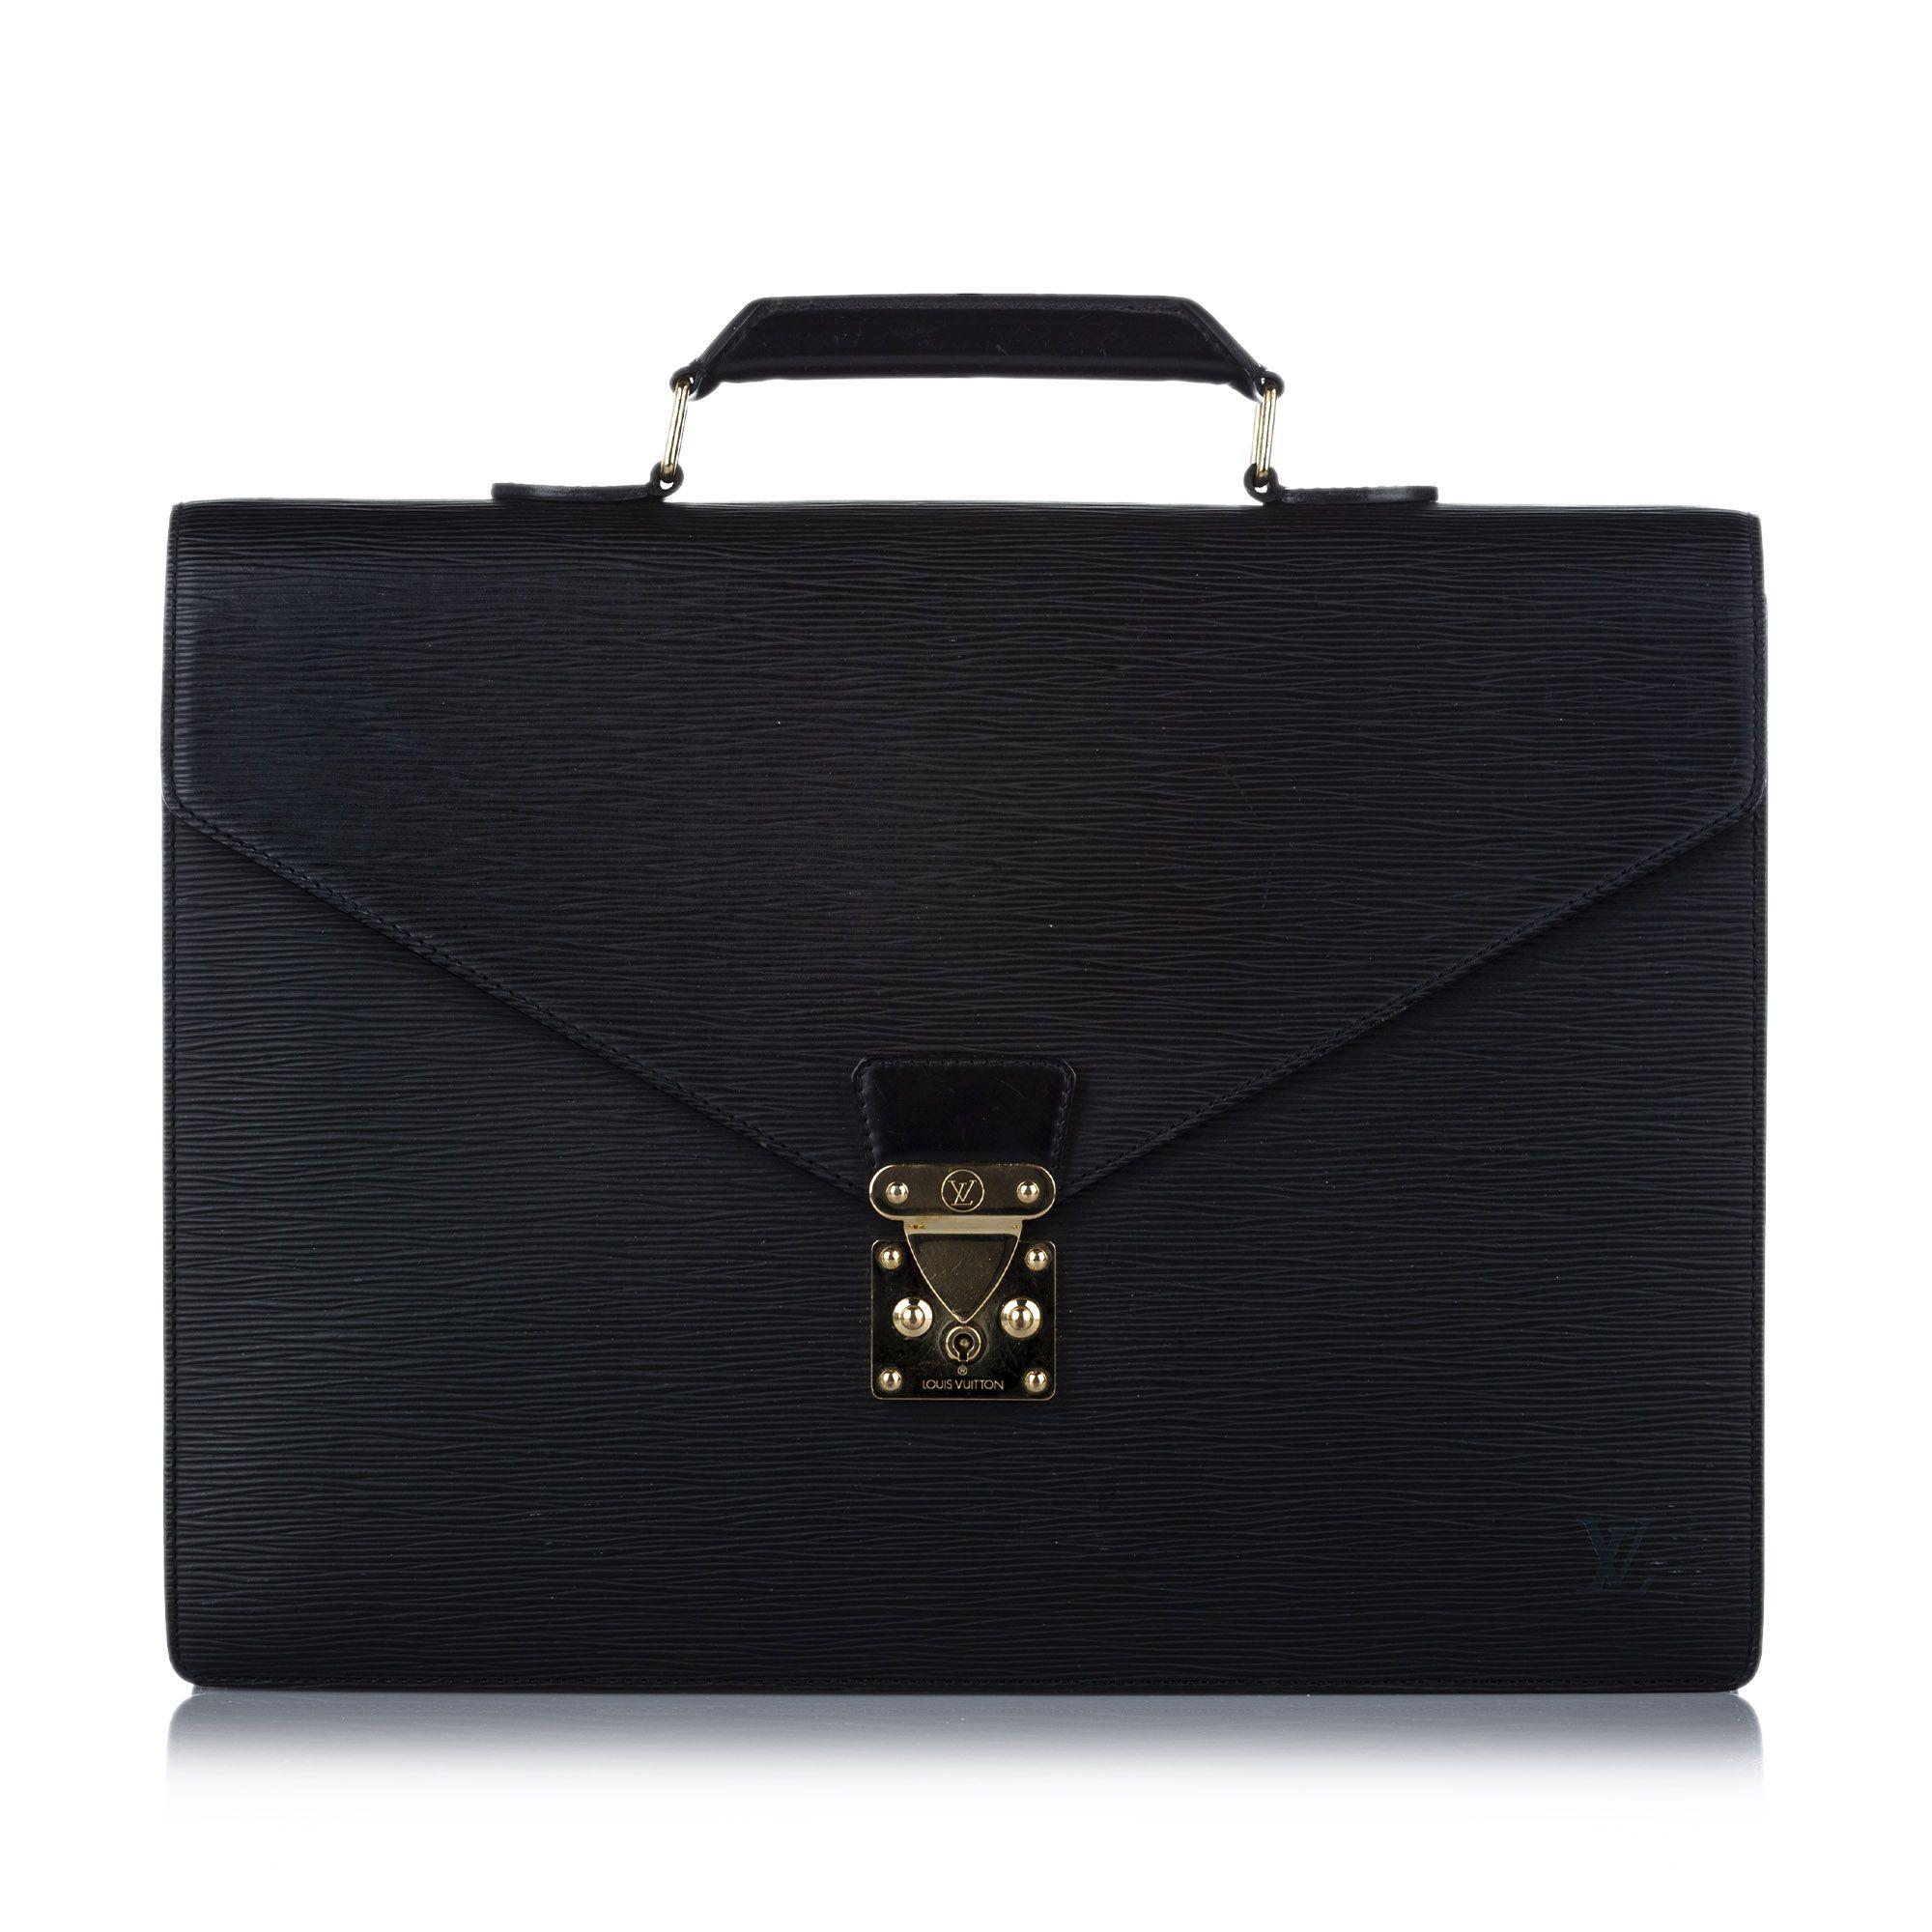 Vintage Louis Vuitton Epi Serviette Ambassadeur Black